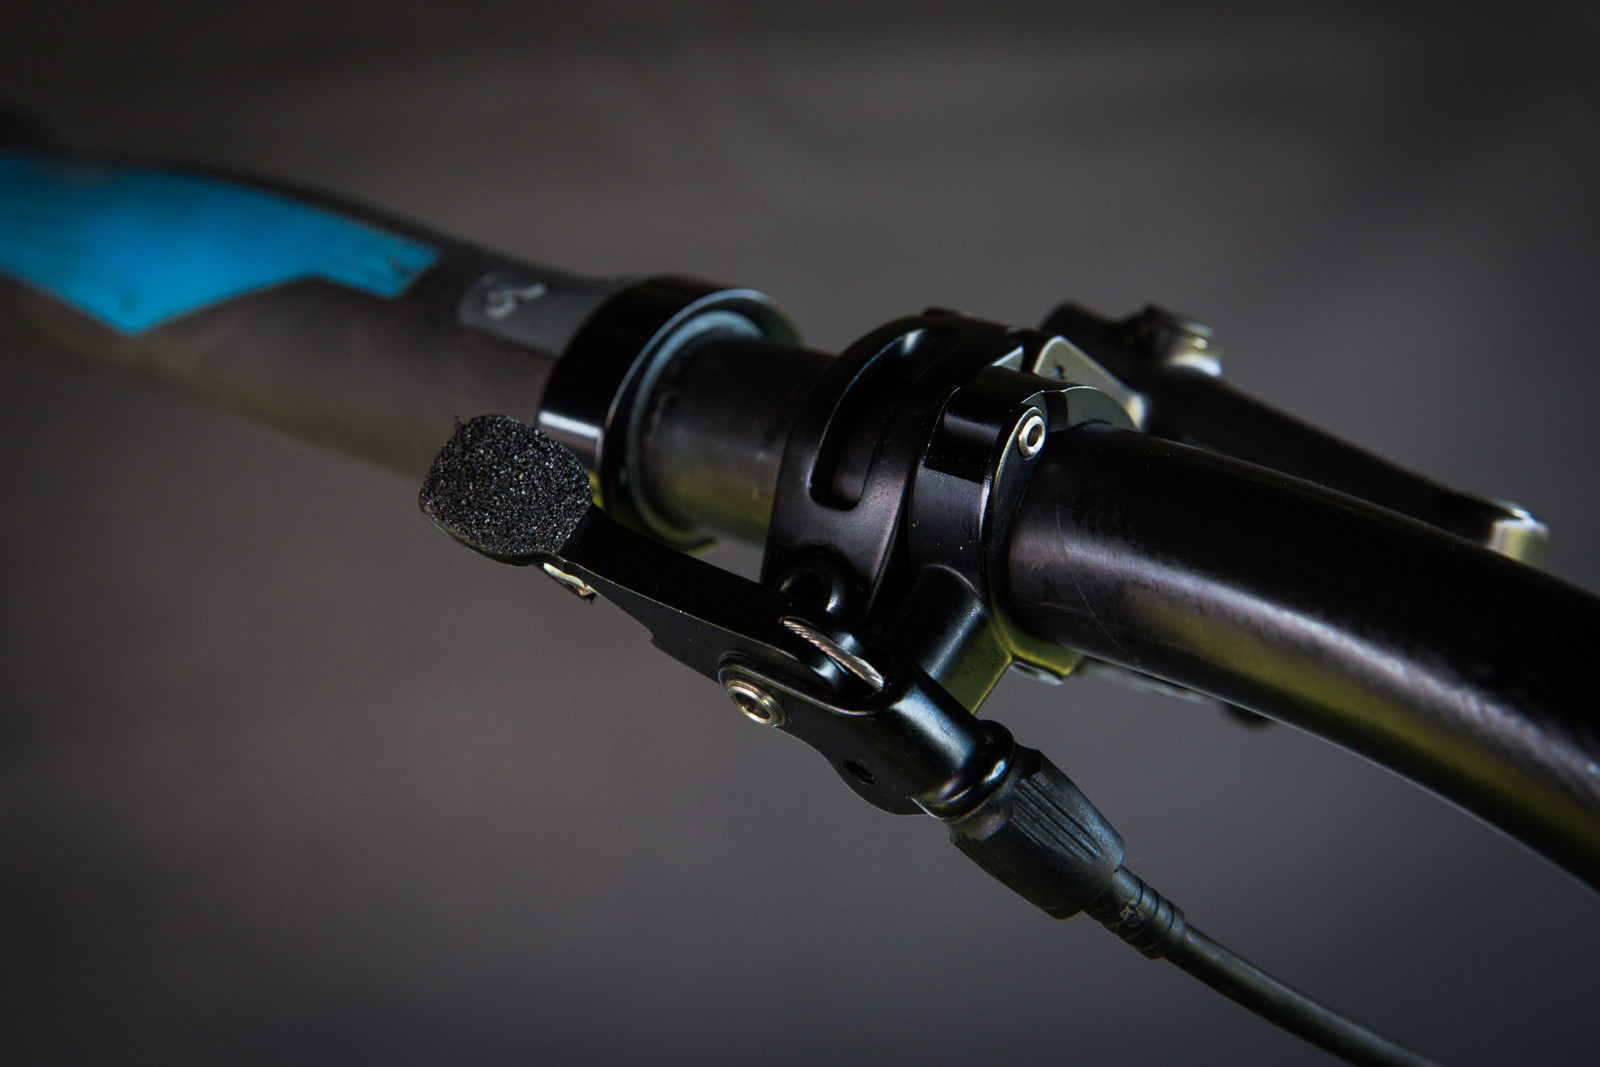 FOX Transfer Dropper Seatpost Lever - PIT BITS - Enduro World Series, Wicklow, Ireland - Mountain Biking Pictures - Vital MTB